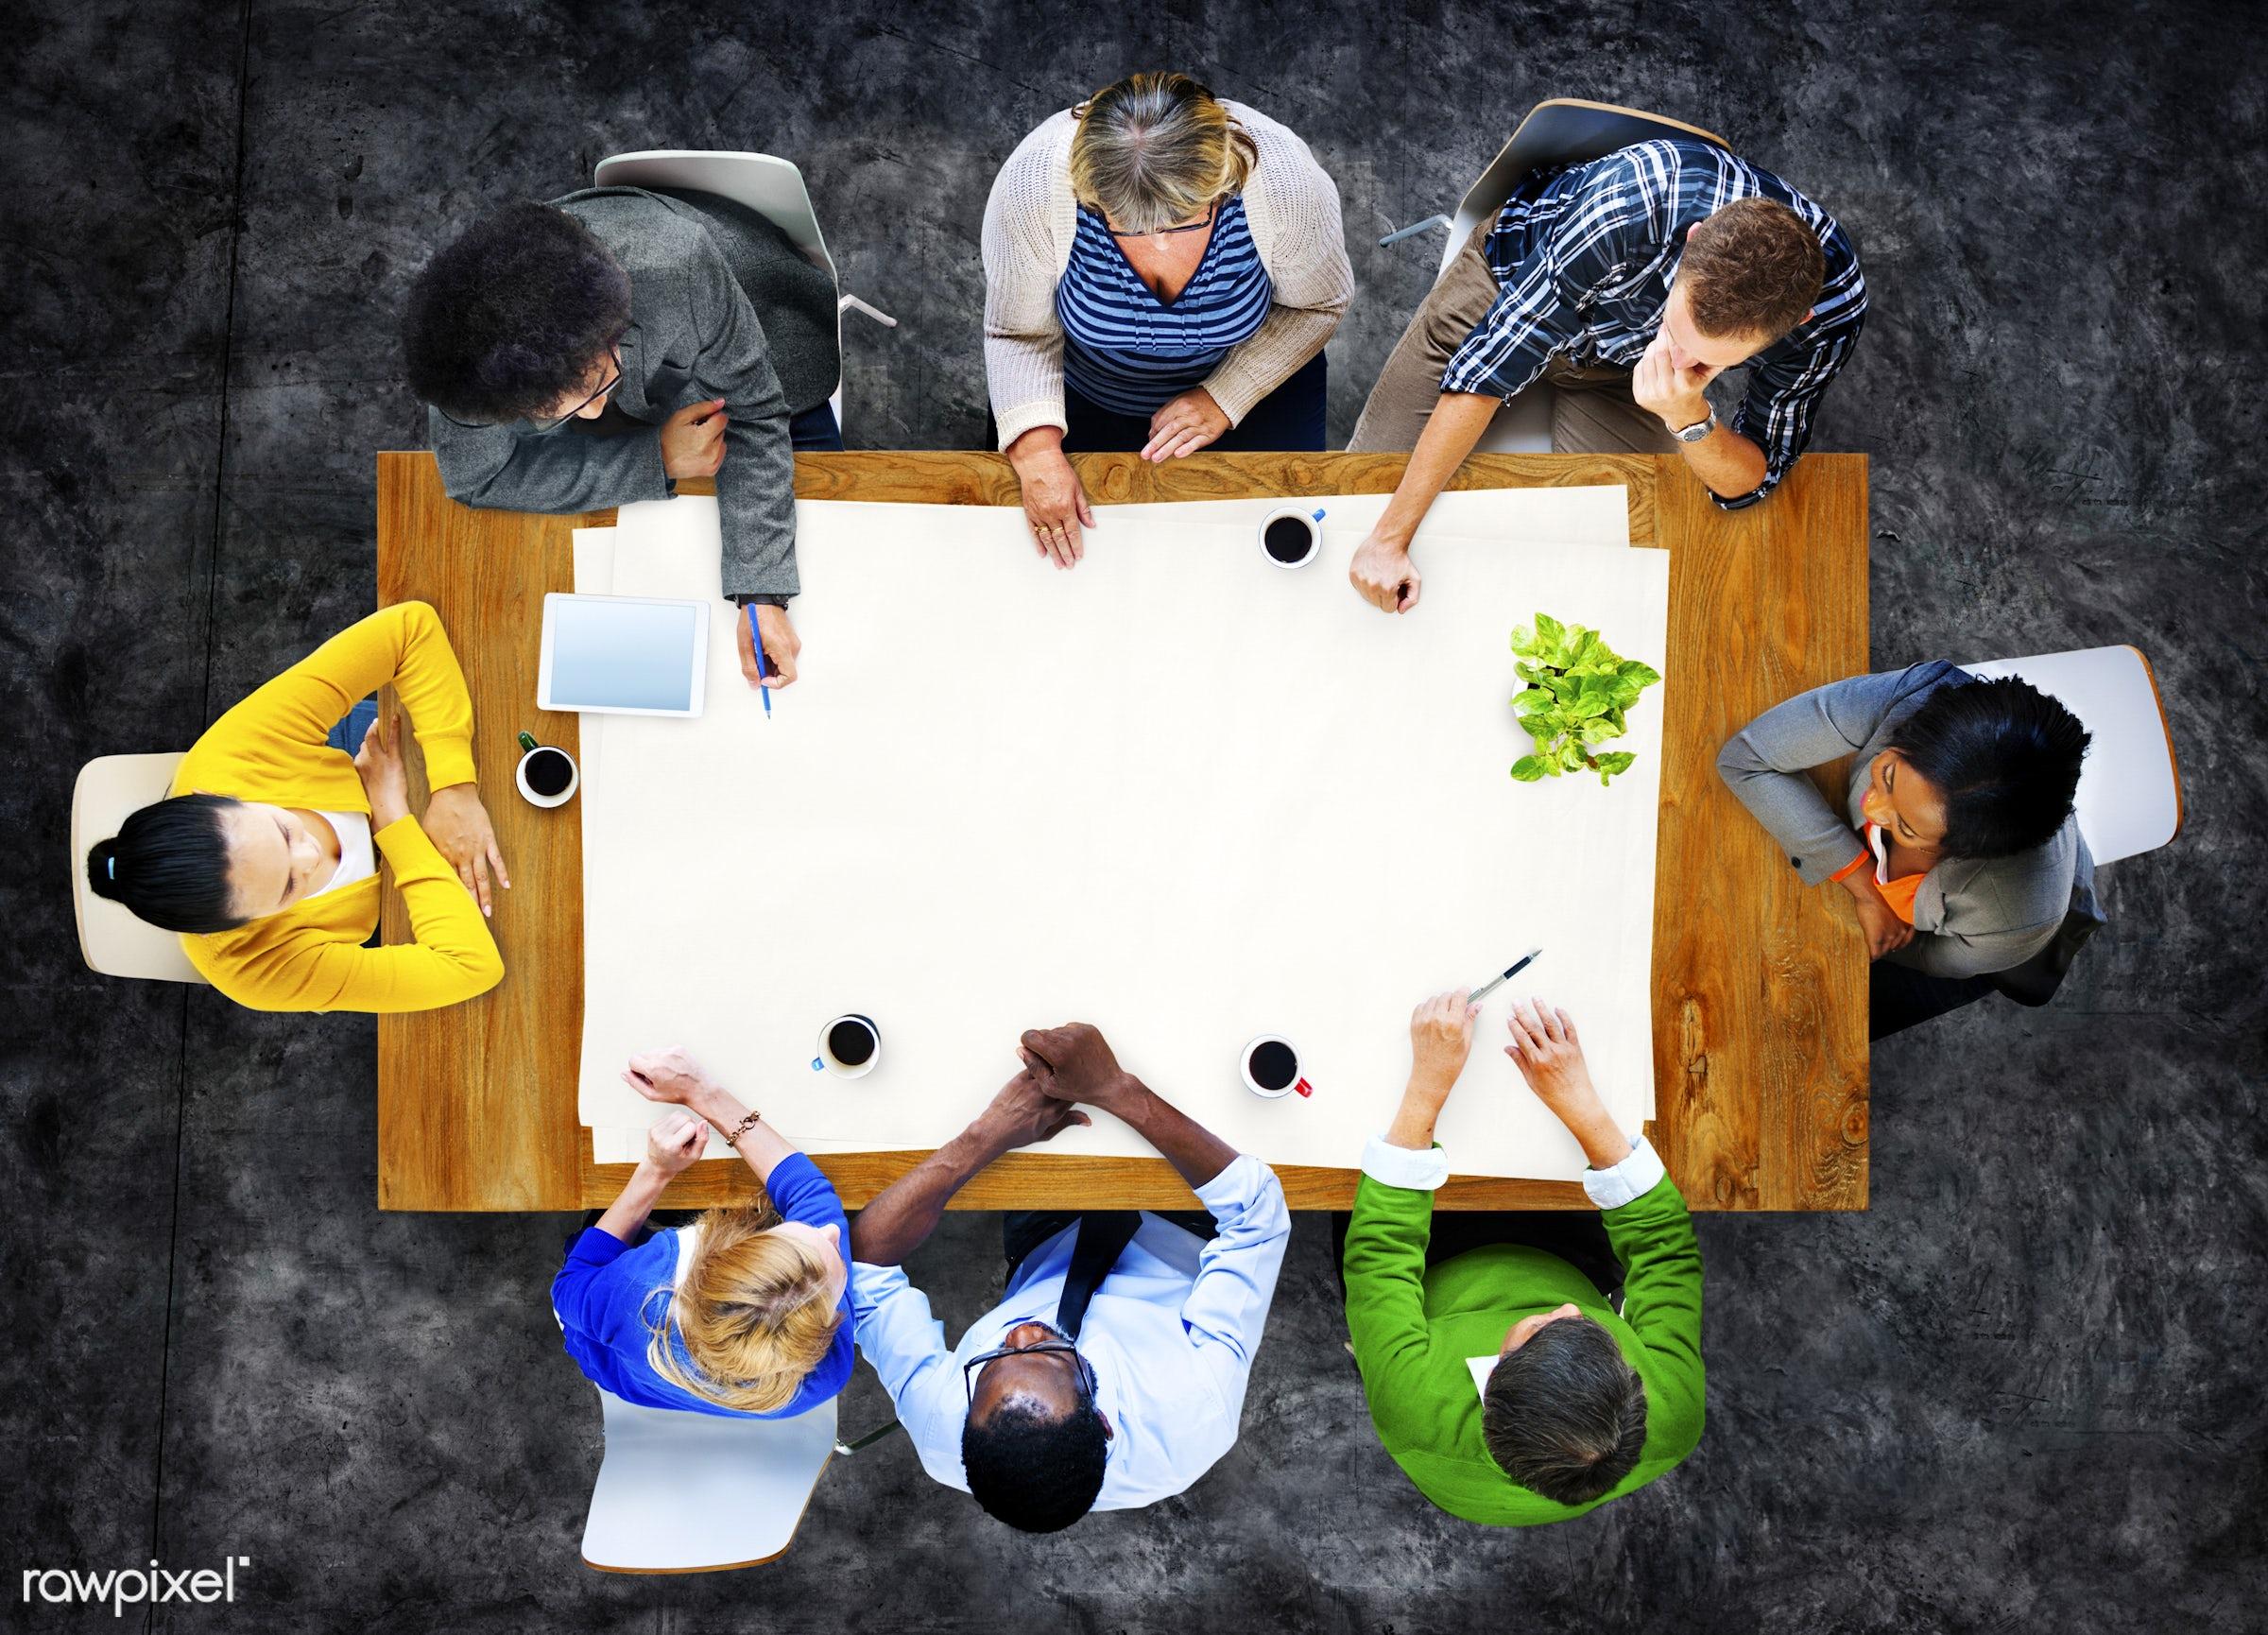 african, african american, african descent, african ethnicity, asian, asian ethnicity, black, blank, brainstorming, carpet,...